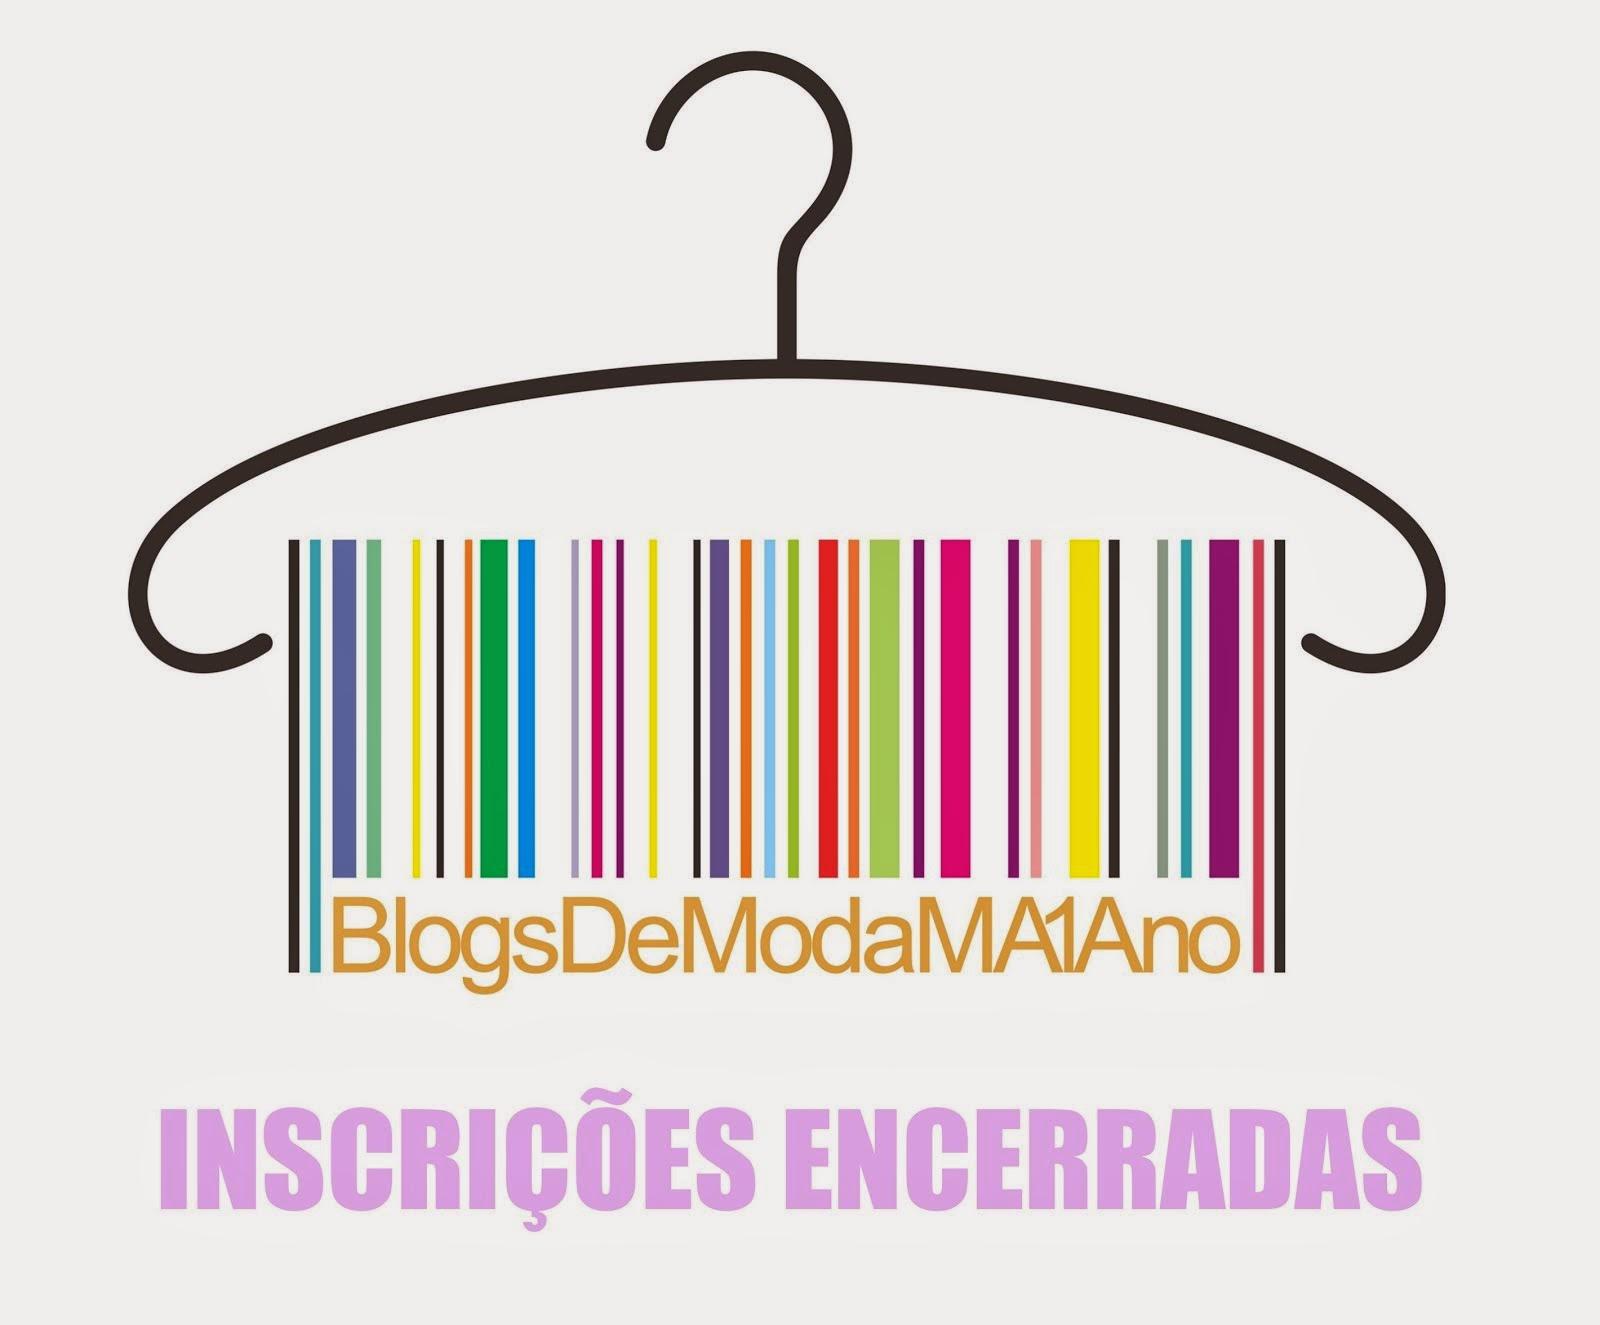 #BlogsDeModaMA1ano